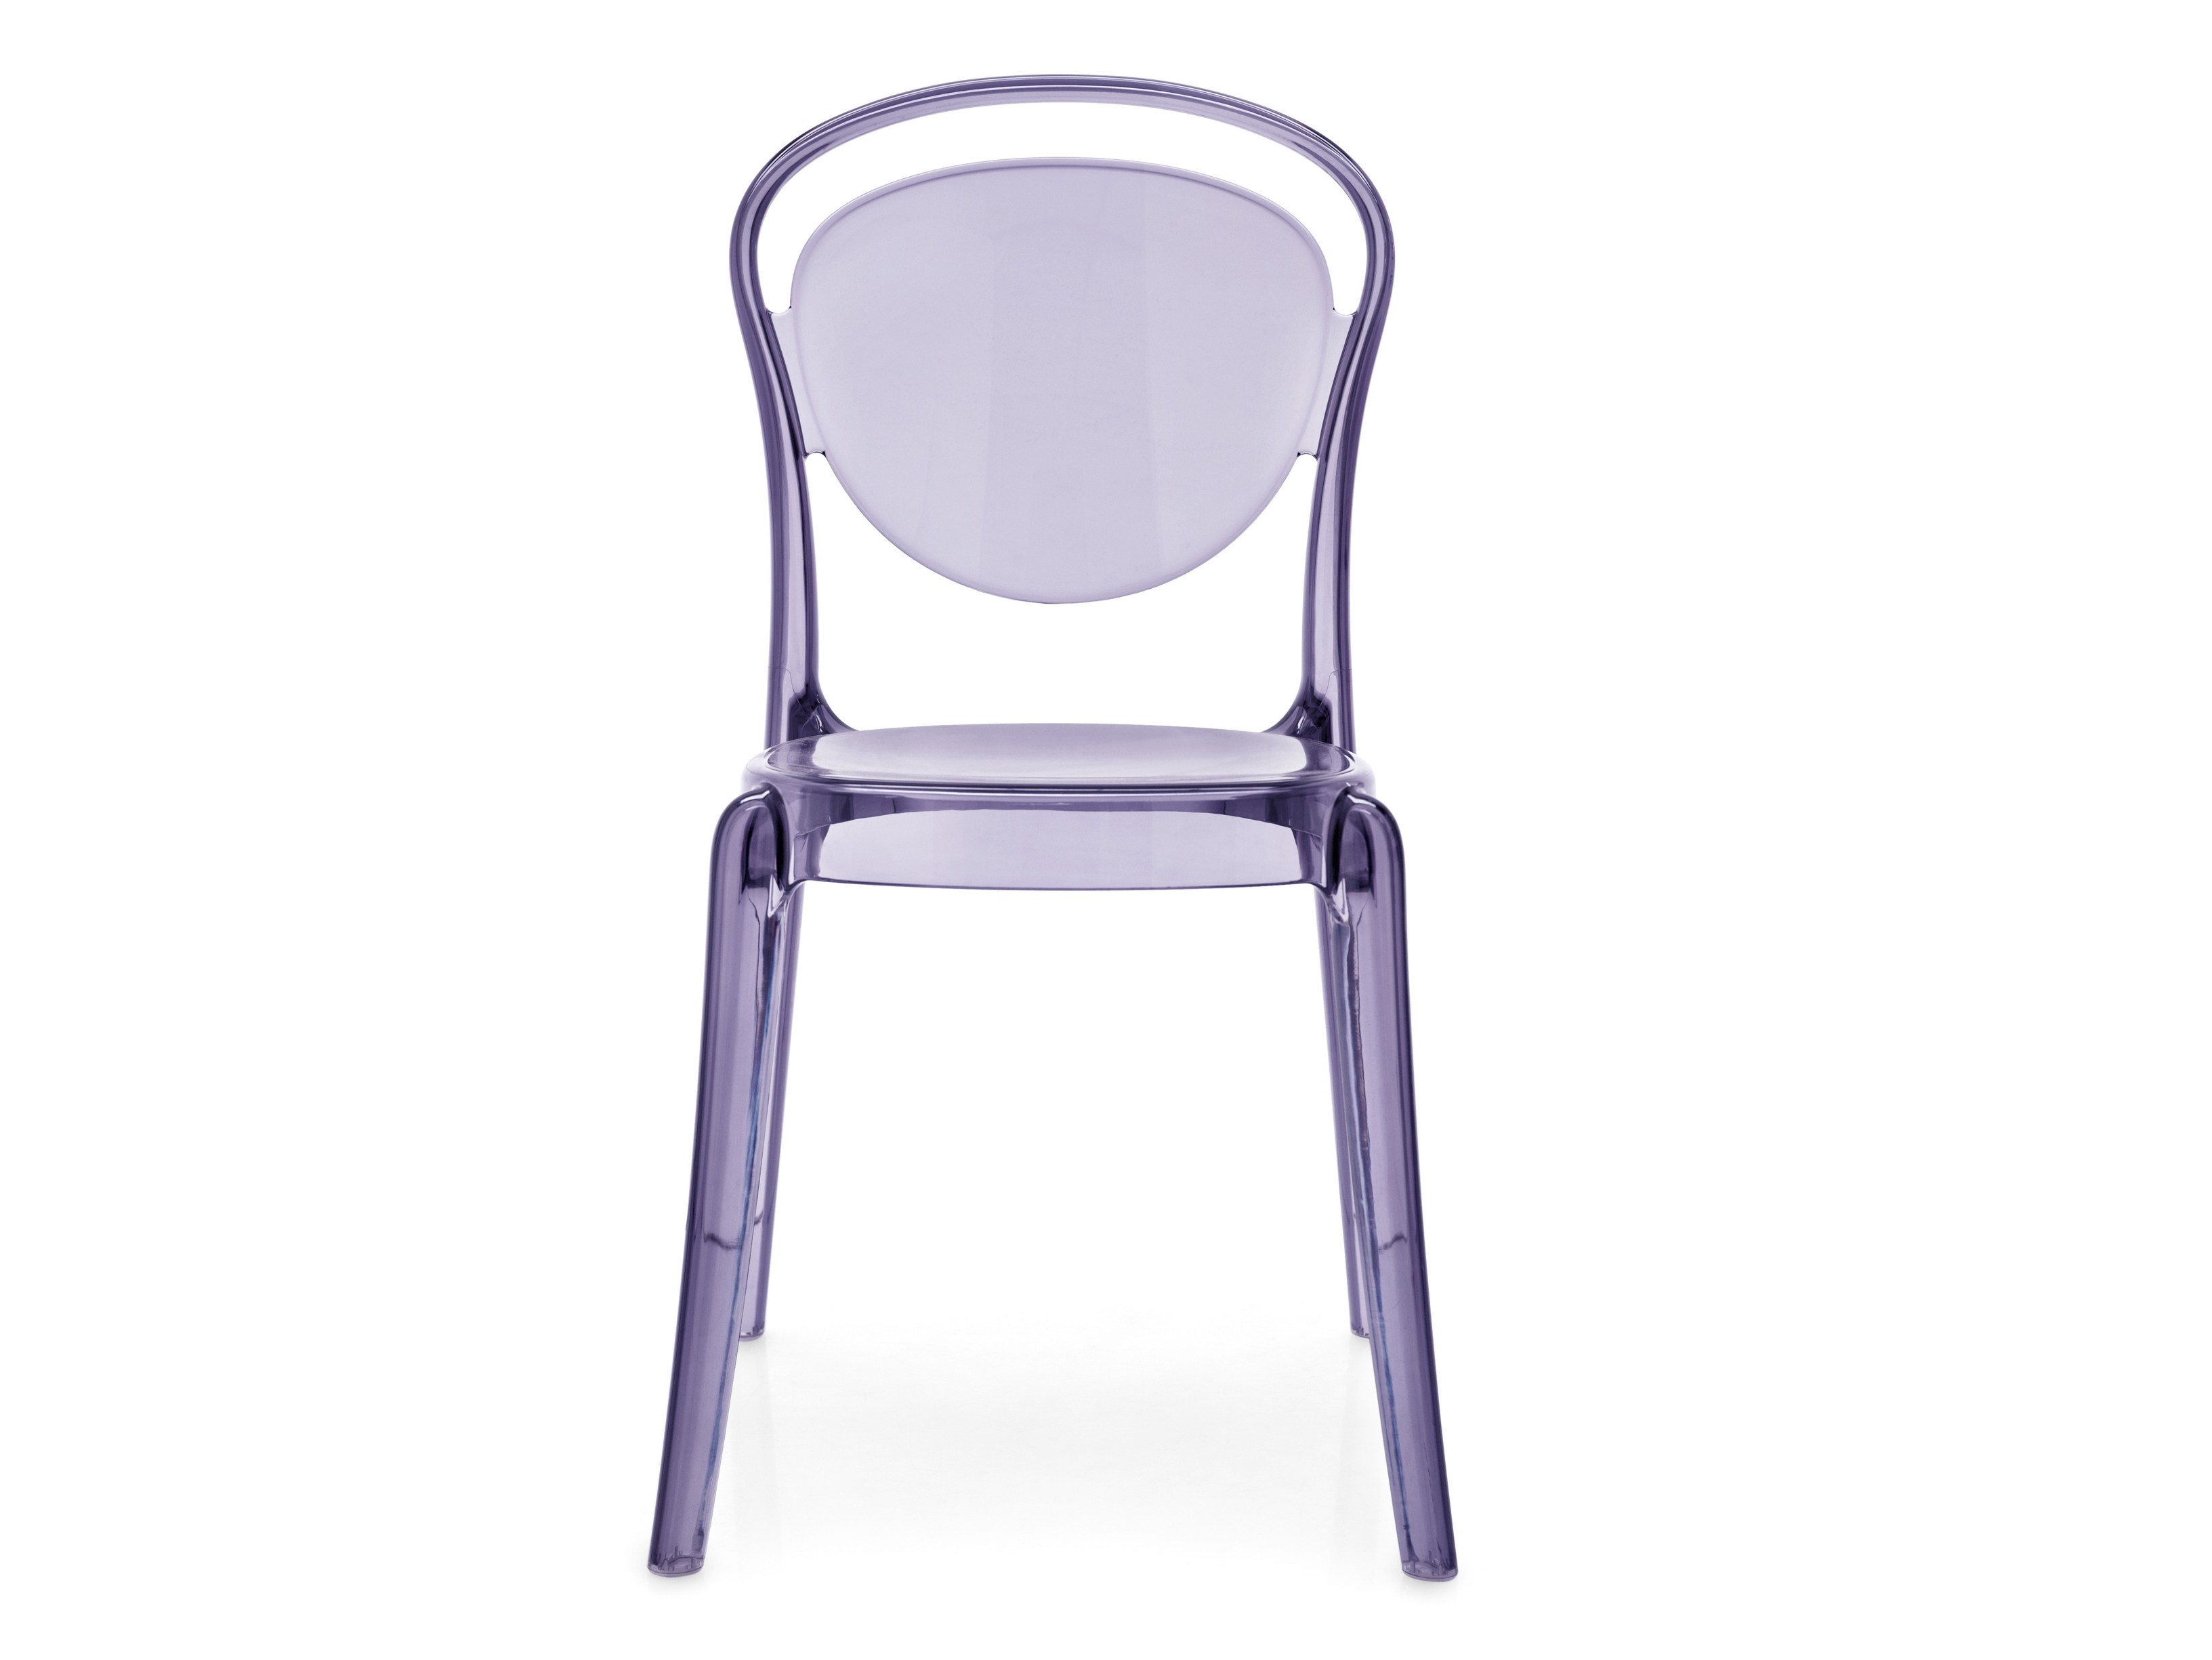 Stackable polycarbonate chair parisienne by calligaris design archirivolto - Sedia parisienne calligaris ...